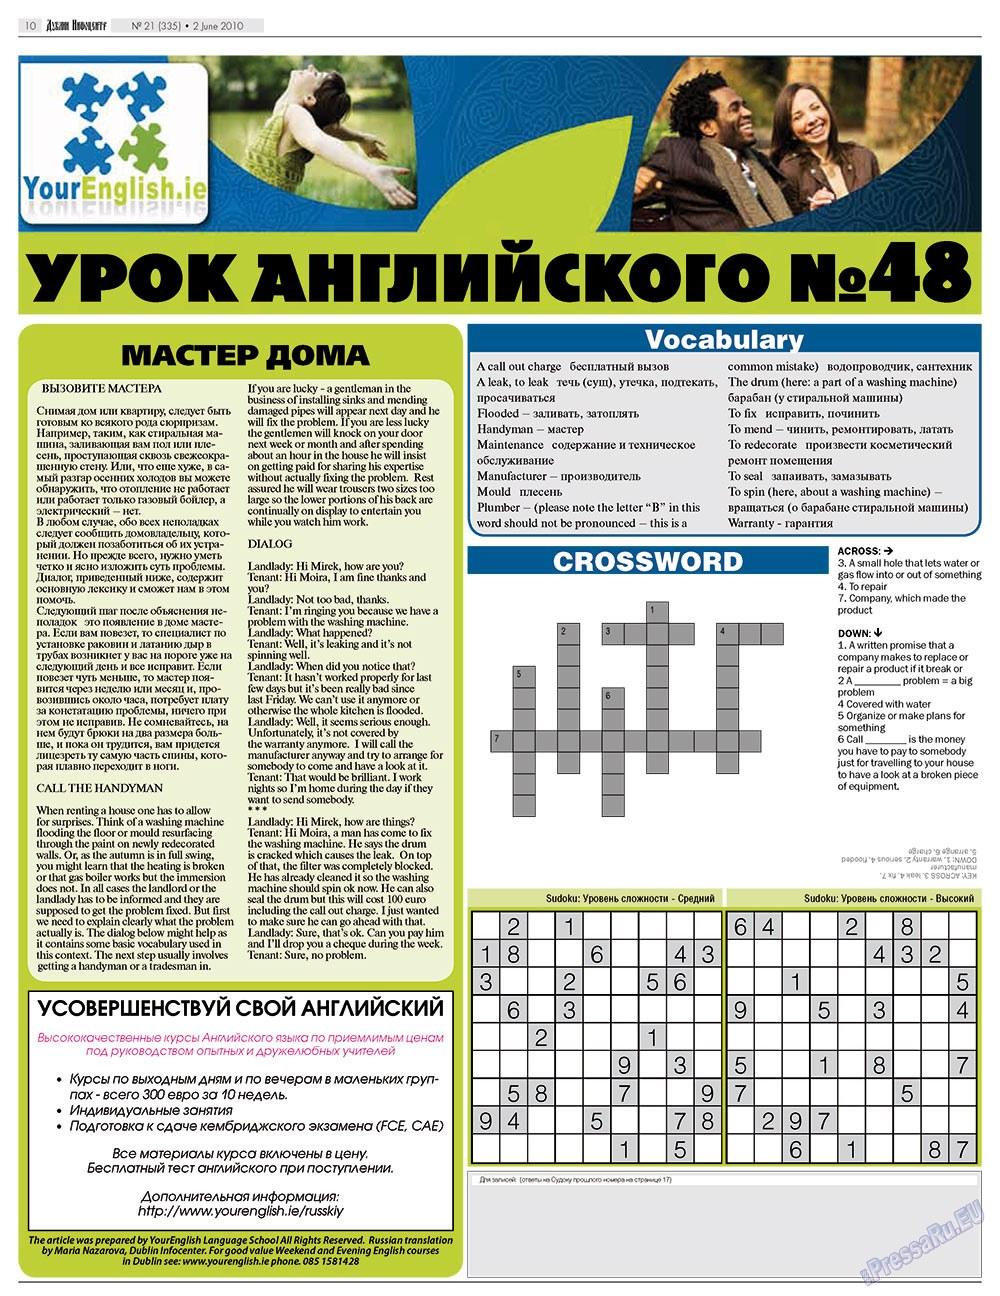 Дублин инфоцентр (газета). 2010 год, номер 21, стр. 10